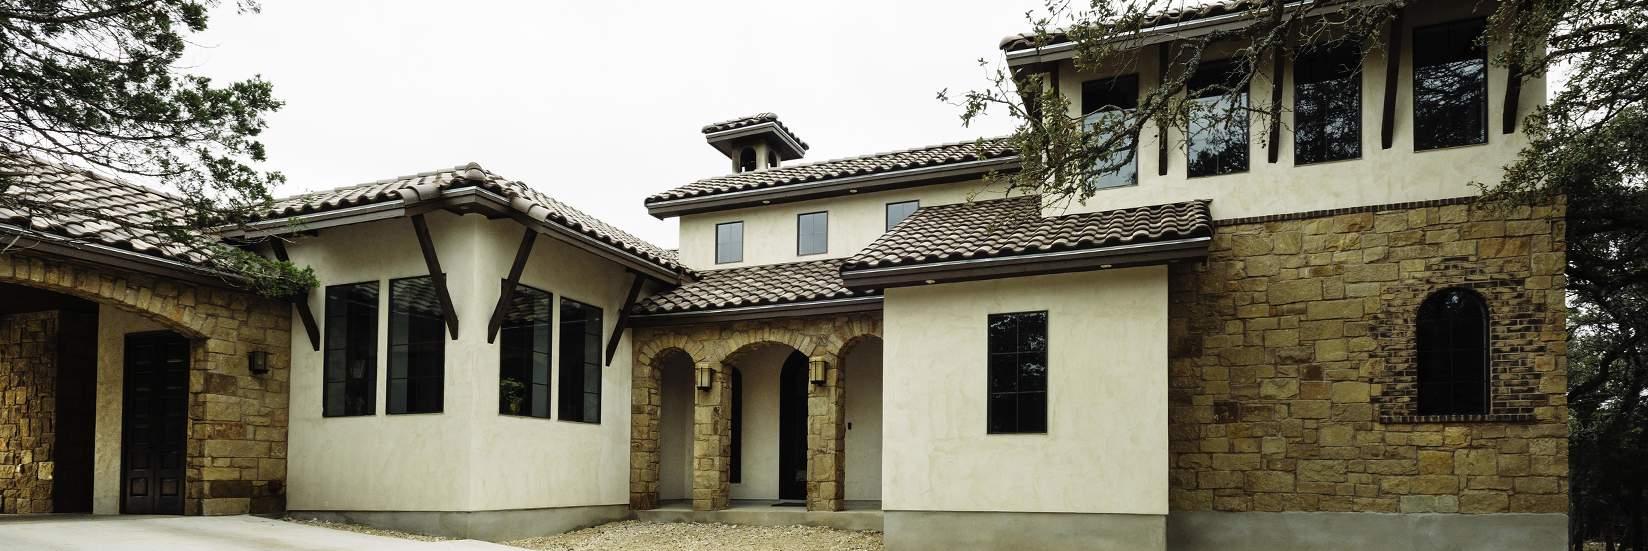 Custom Home Builder New Braunfels San Antonio Hill Country